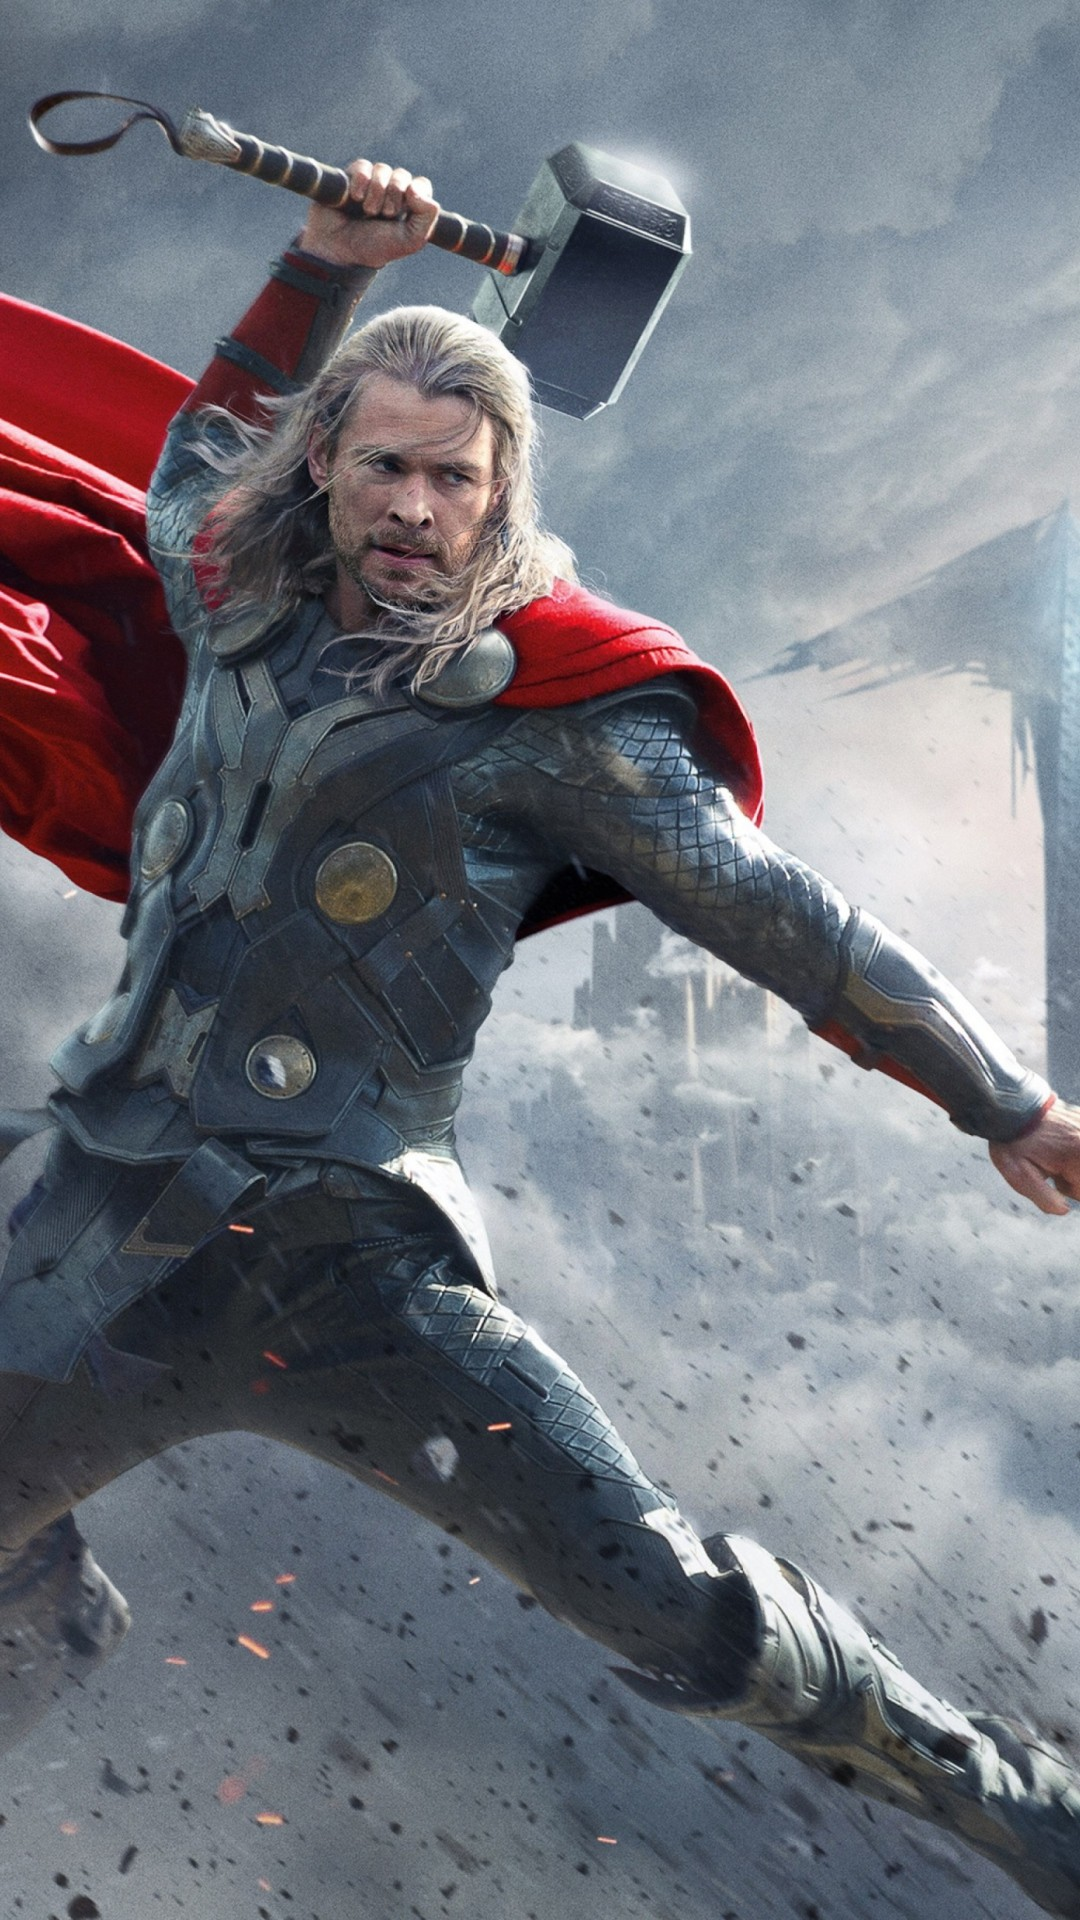 1920x1080 Thor Ragnarok Movie Wallpapers